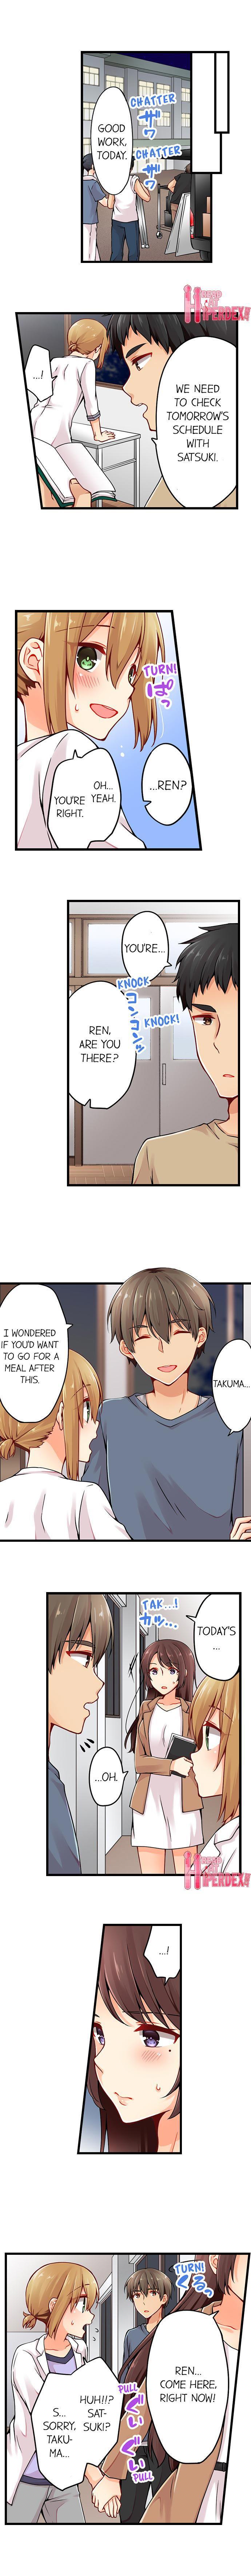 Ren Arisugawa Is Actually A Girl 548